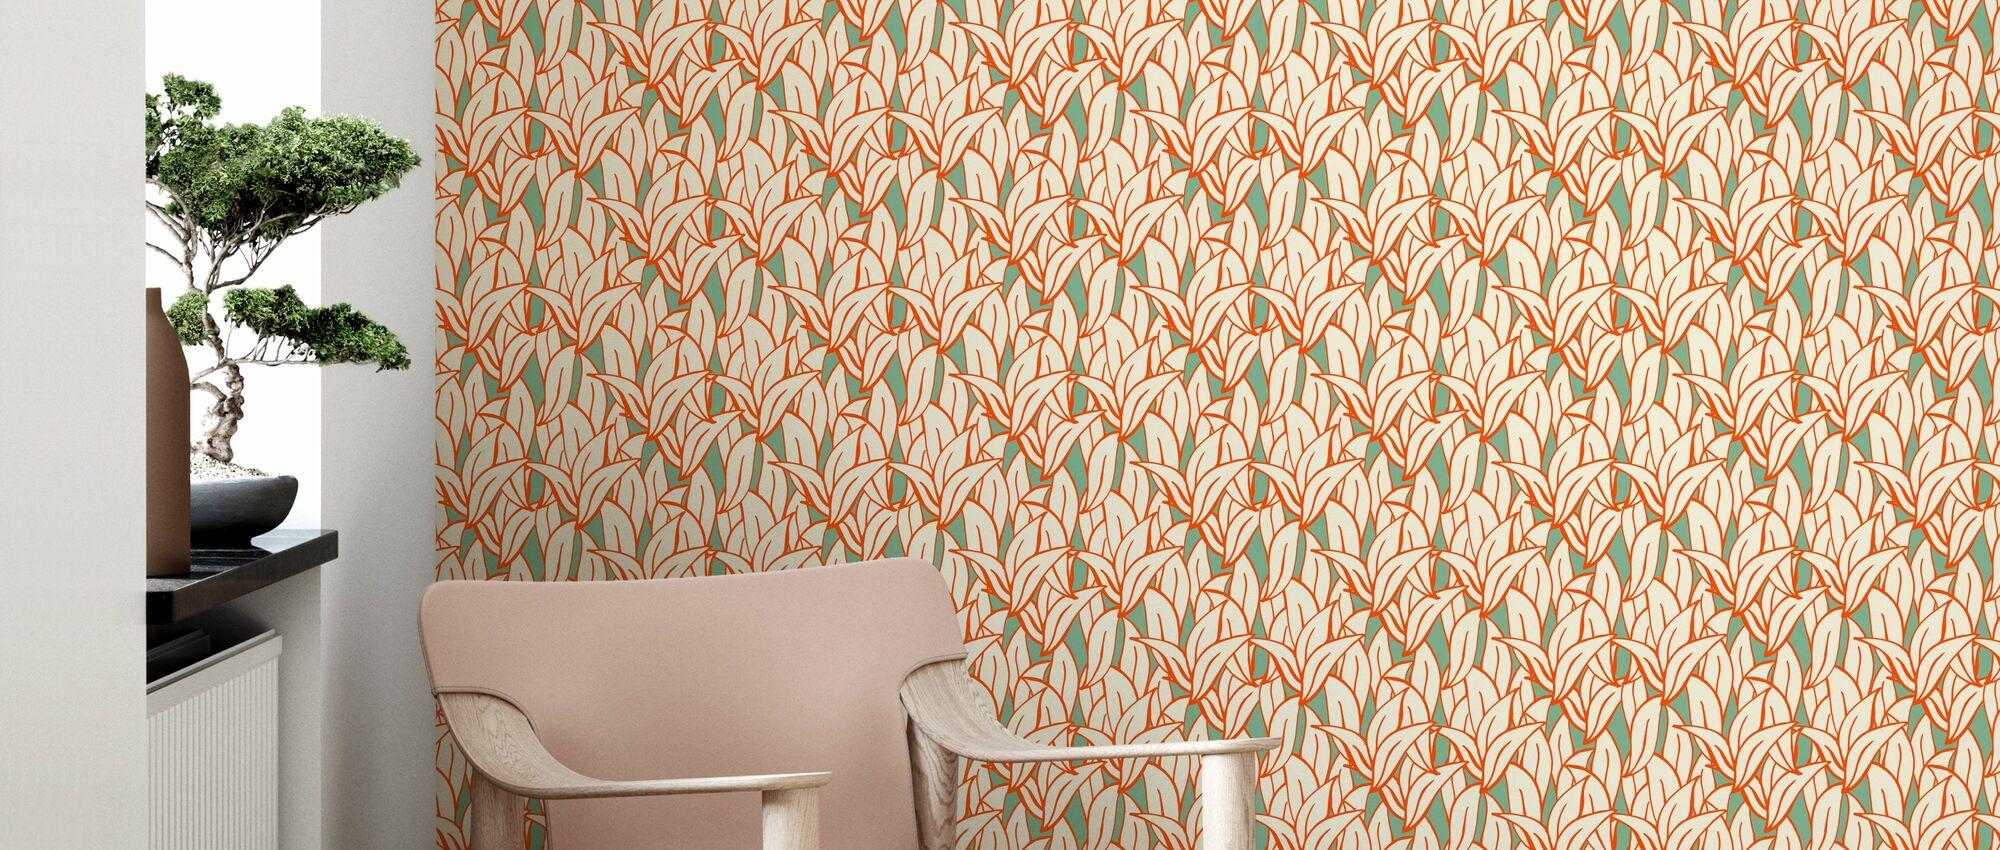 Mostly Leafs Orange - Wallpaper - Living Room